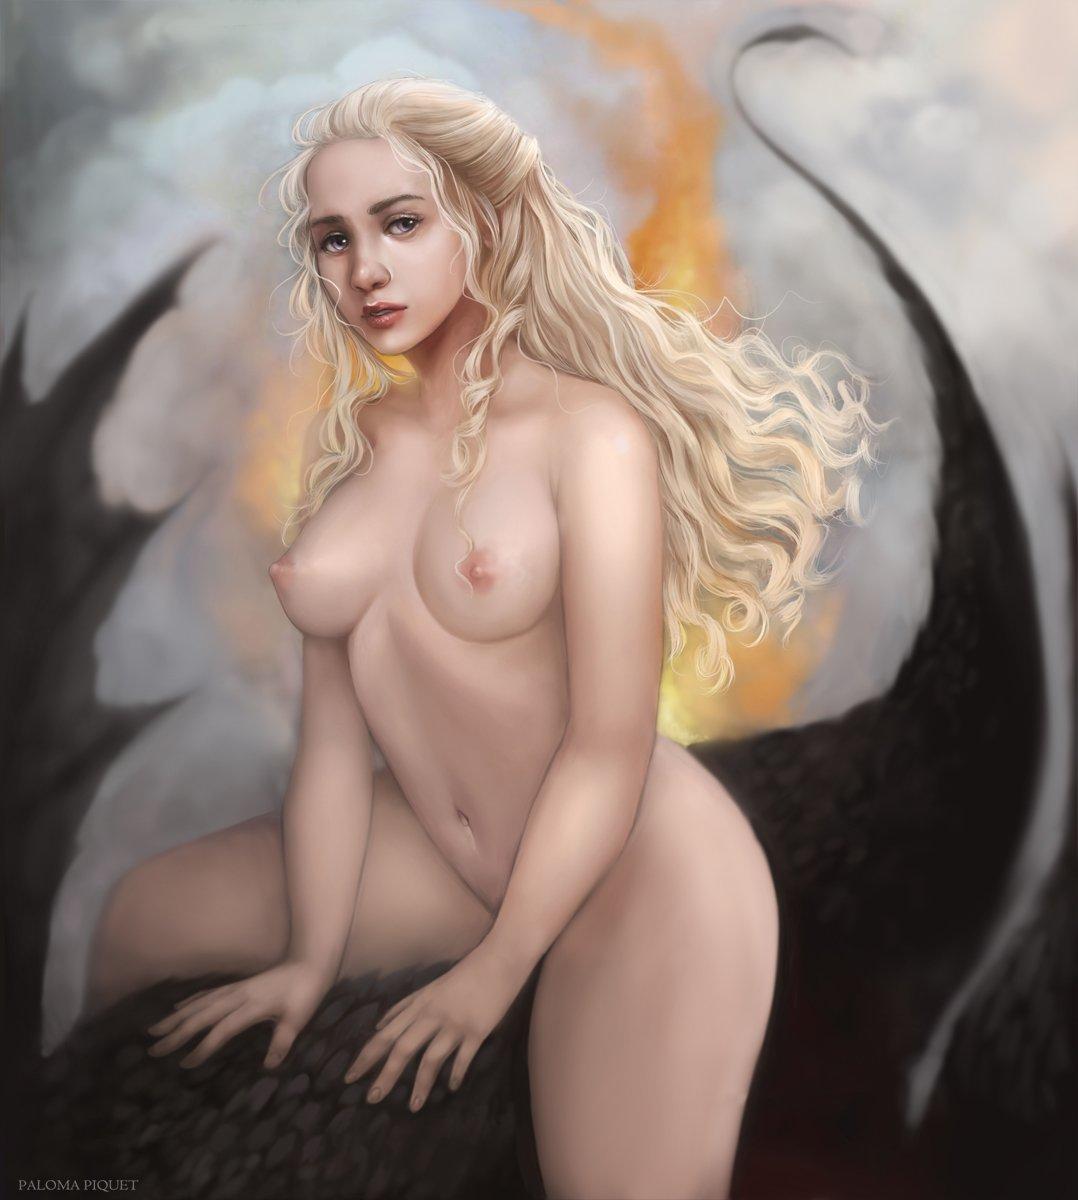 #GOTfinal #JuegodeTronos #TheFinalEpisode #DaenerysTargaryen #Daenerys